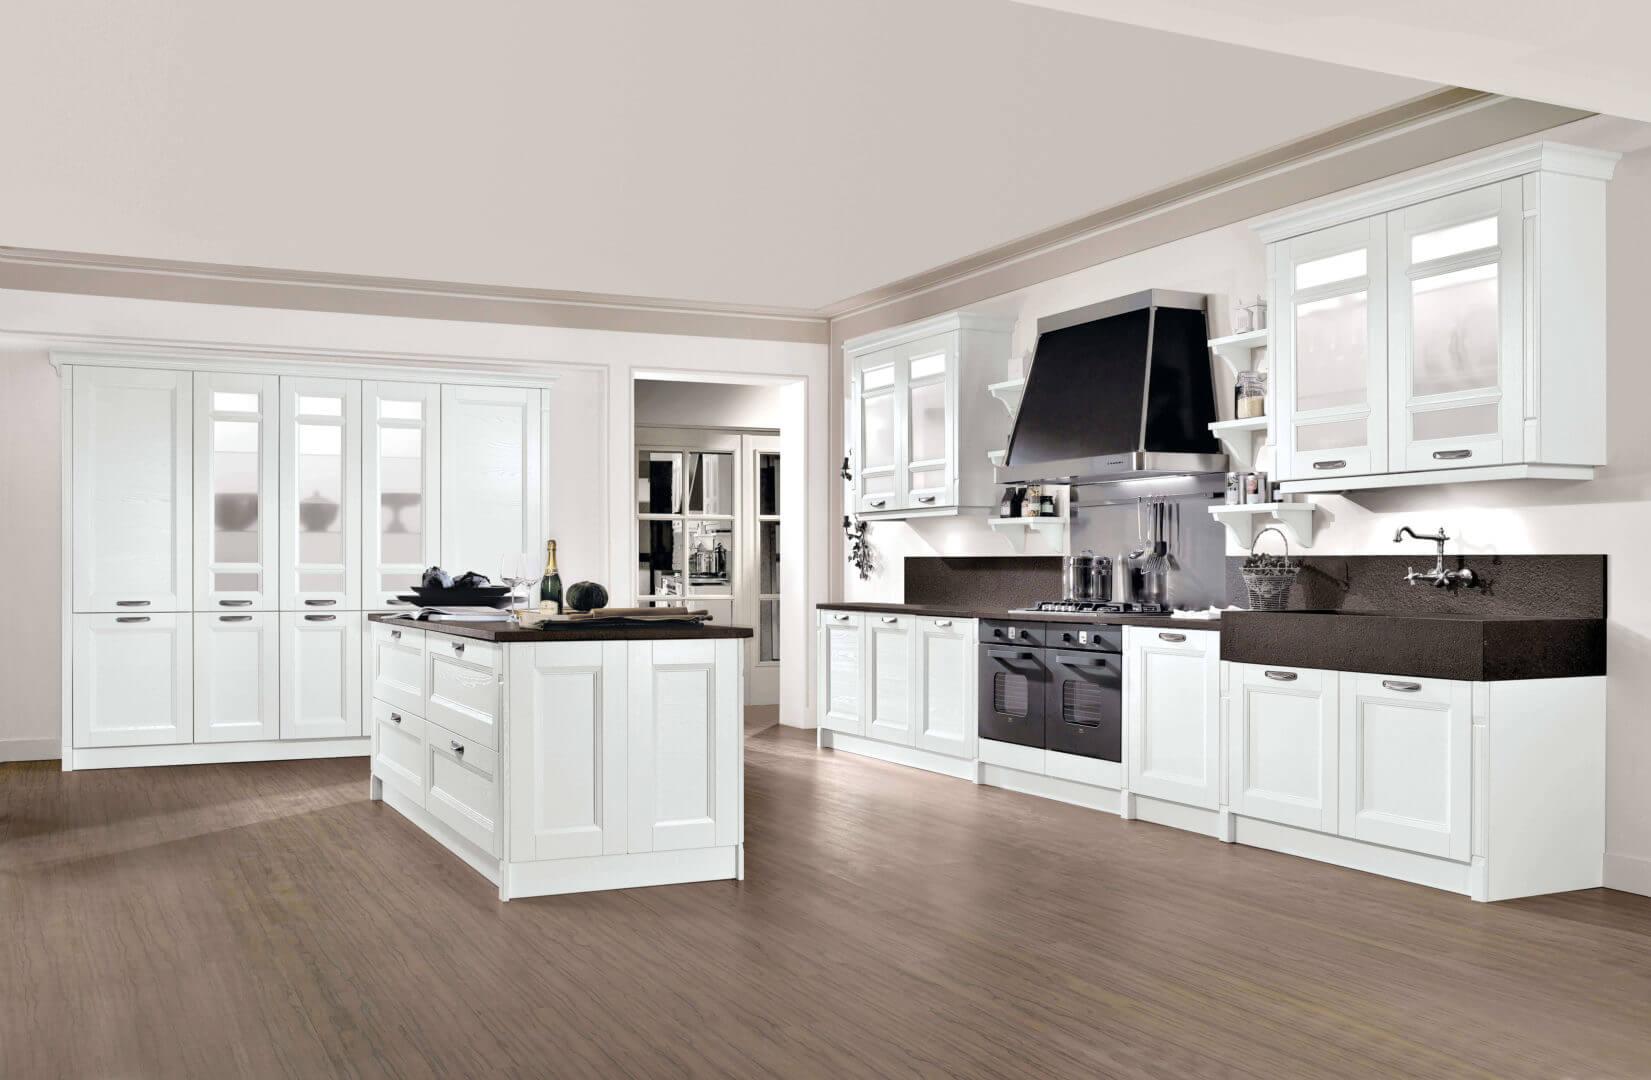 cucina gioiosa bianco nero